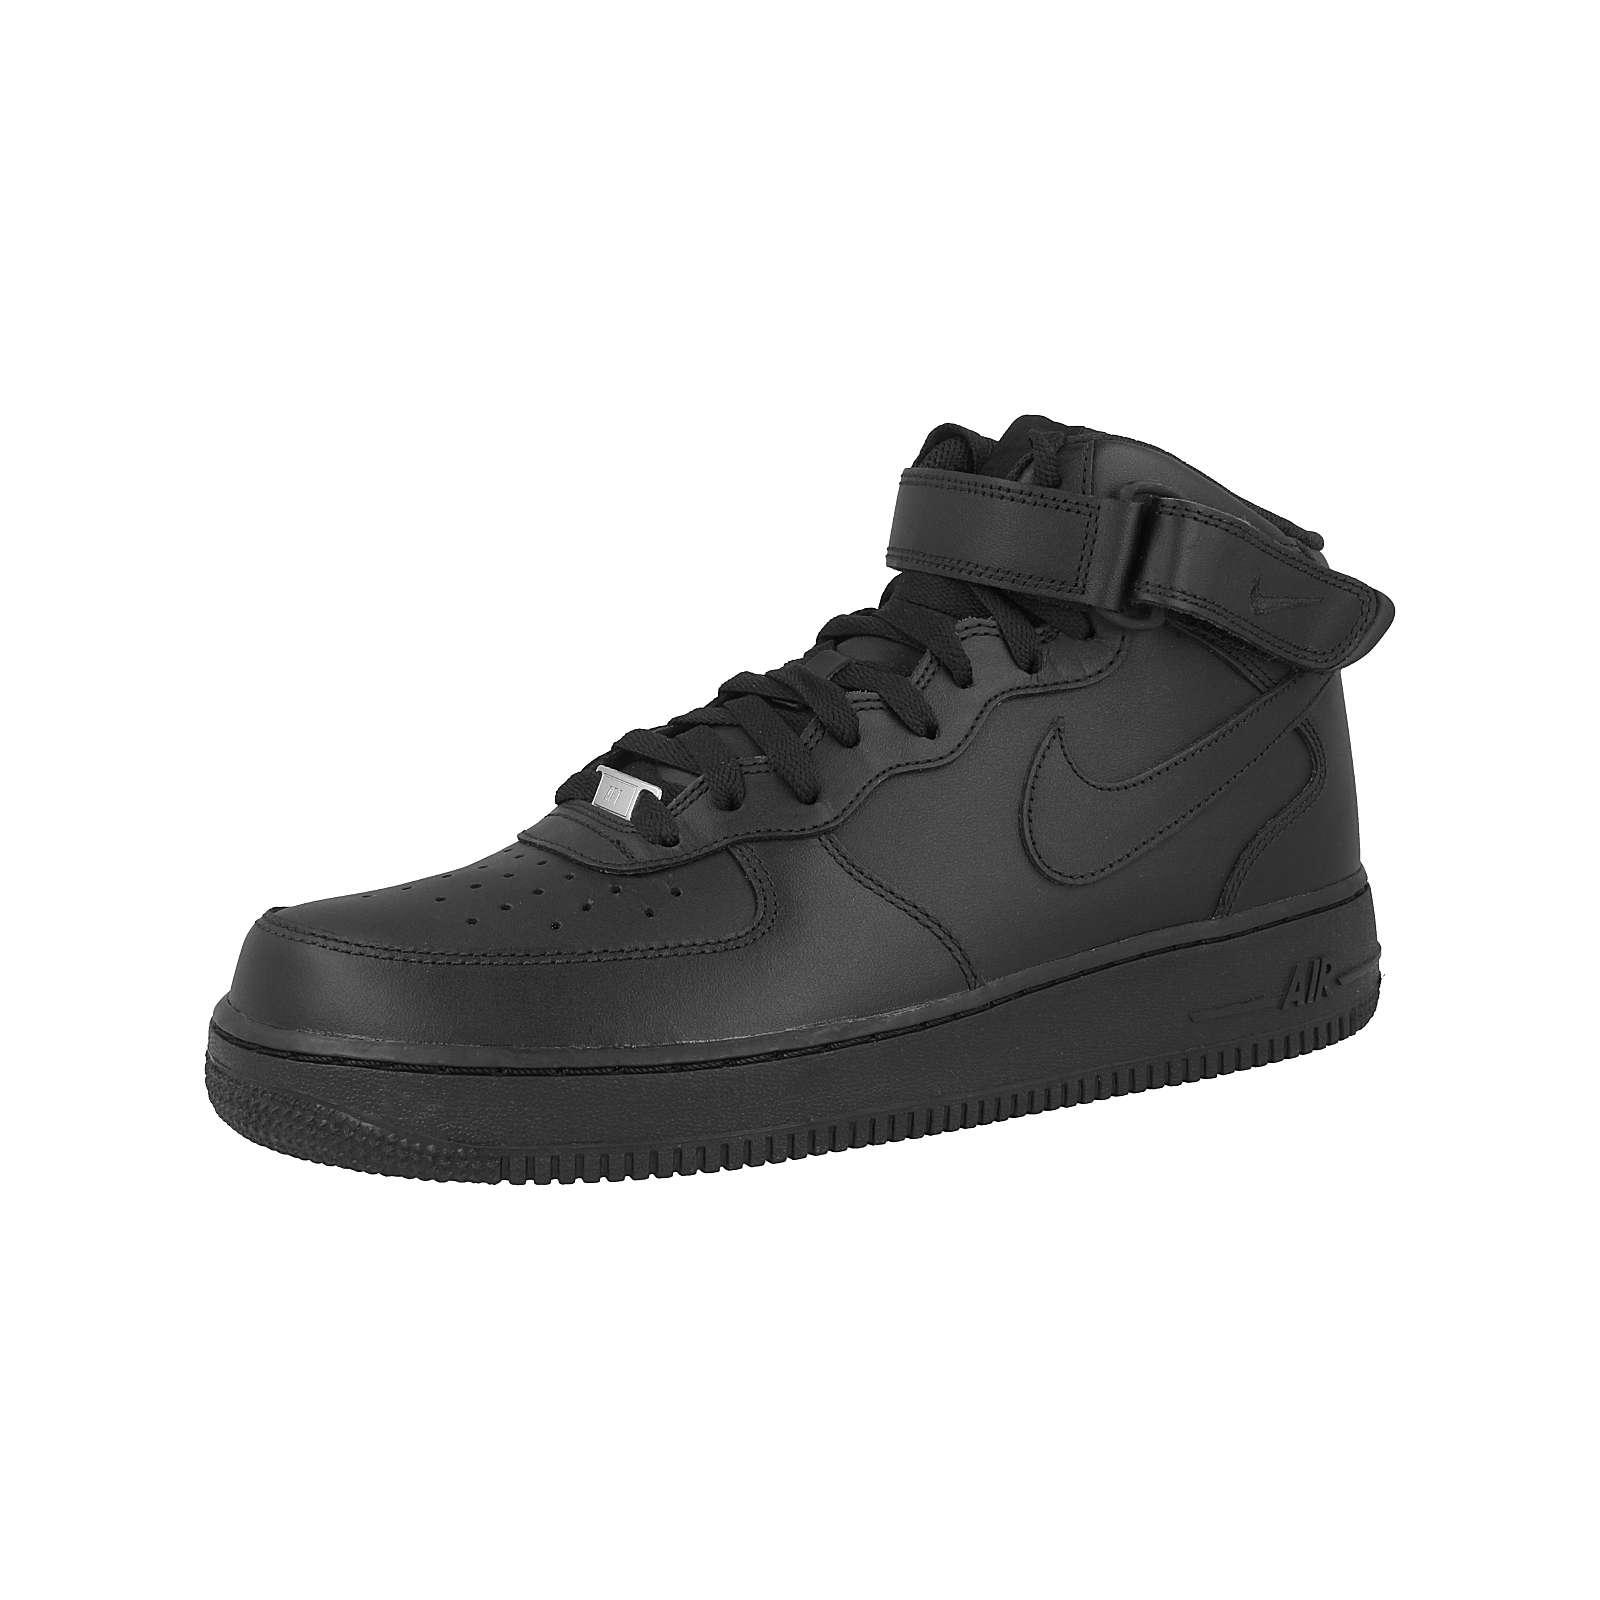 Nike Sportswear Air Force 1 MID ´07 Sneakers High schwarz Herren Gr. 42,5